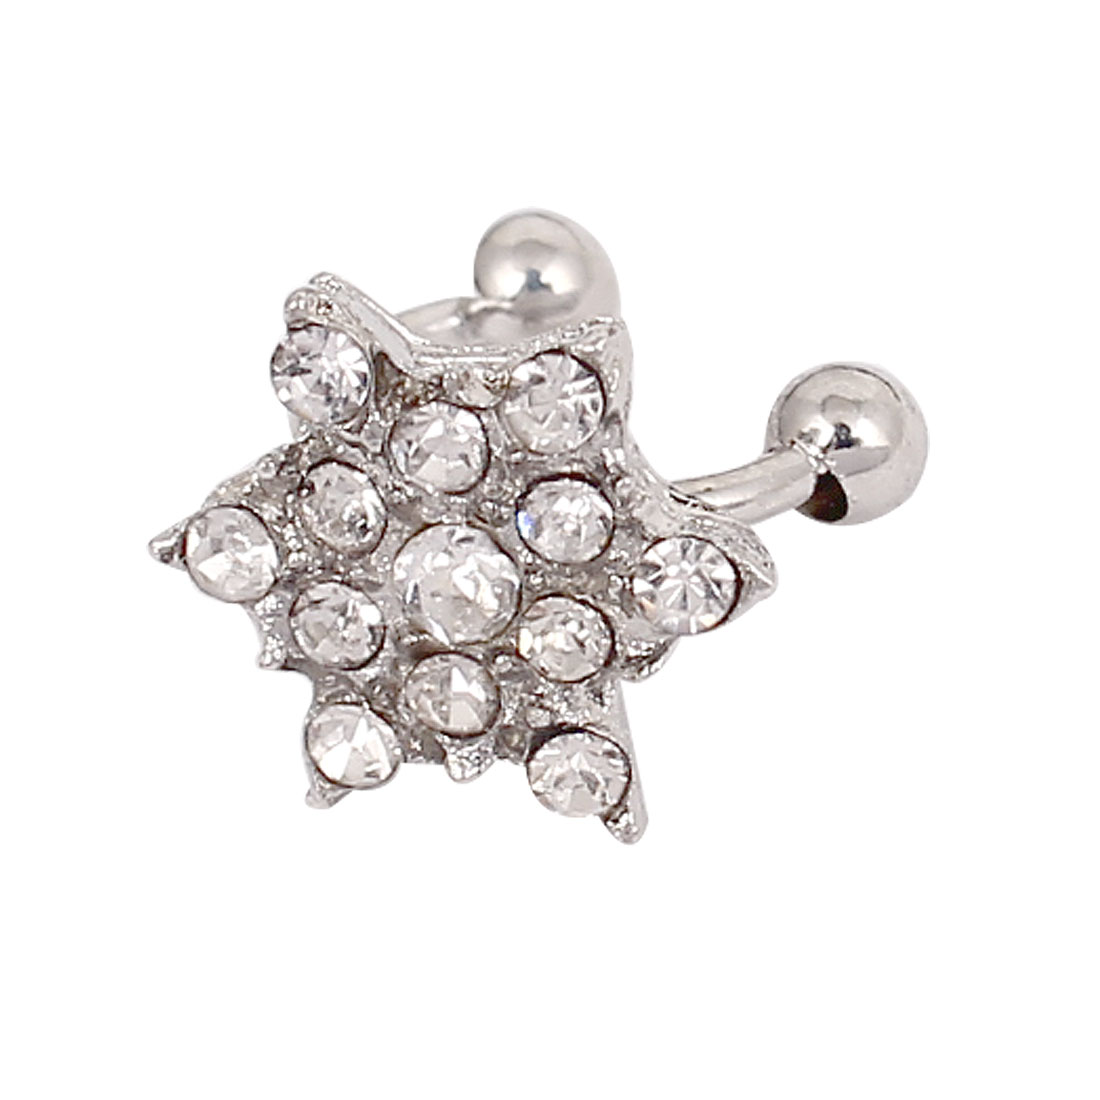 Faux Rhinestone Snowflake Non-pierced Ear Bone Cuff Clip-on Earring Silver Tone